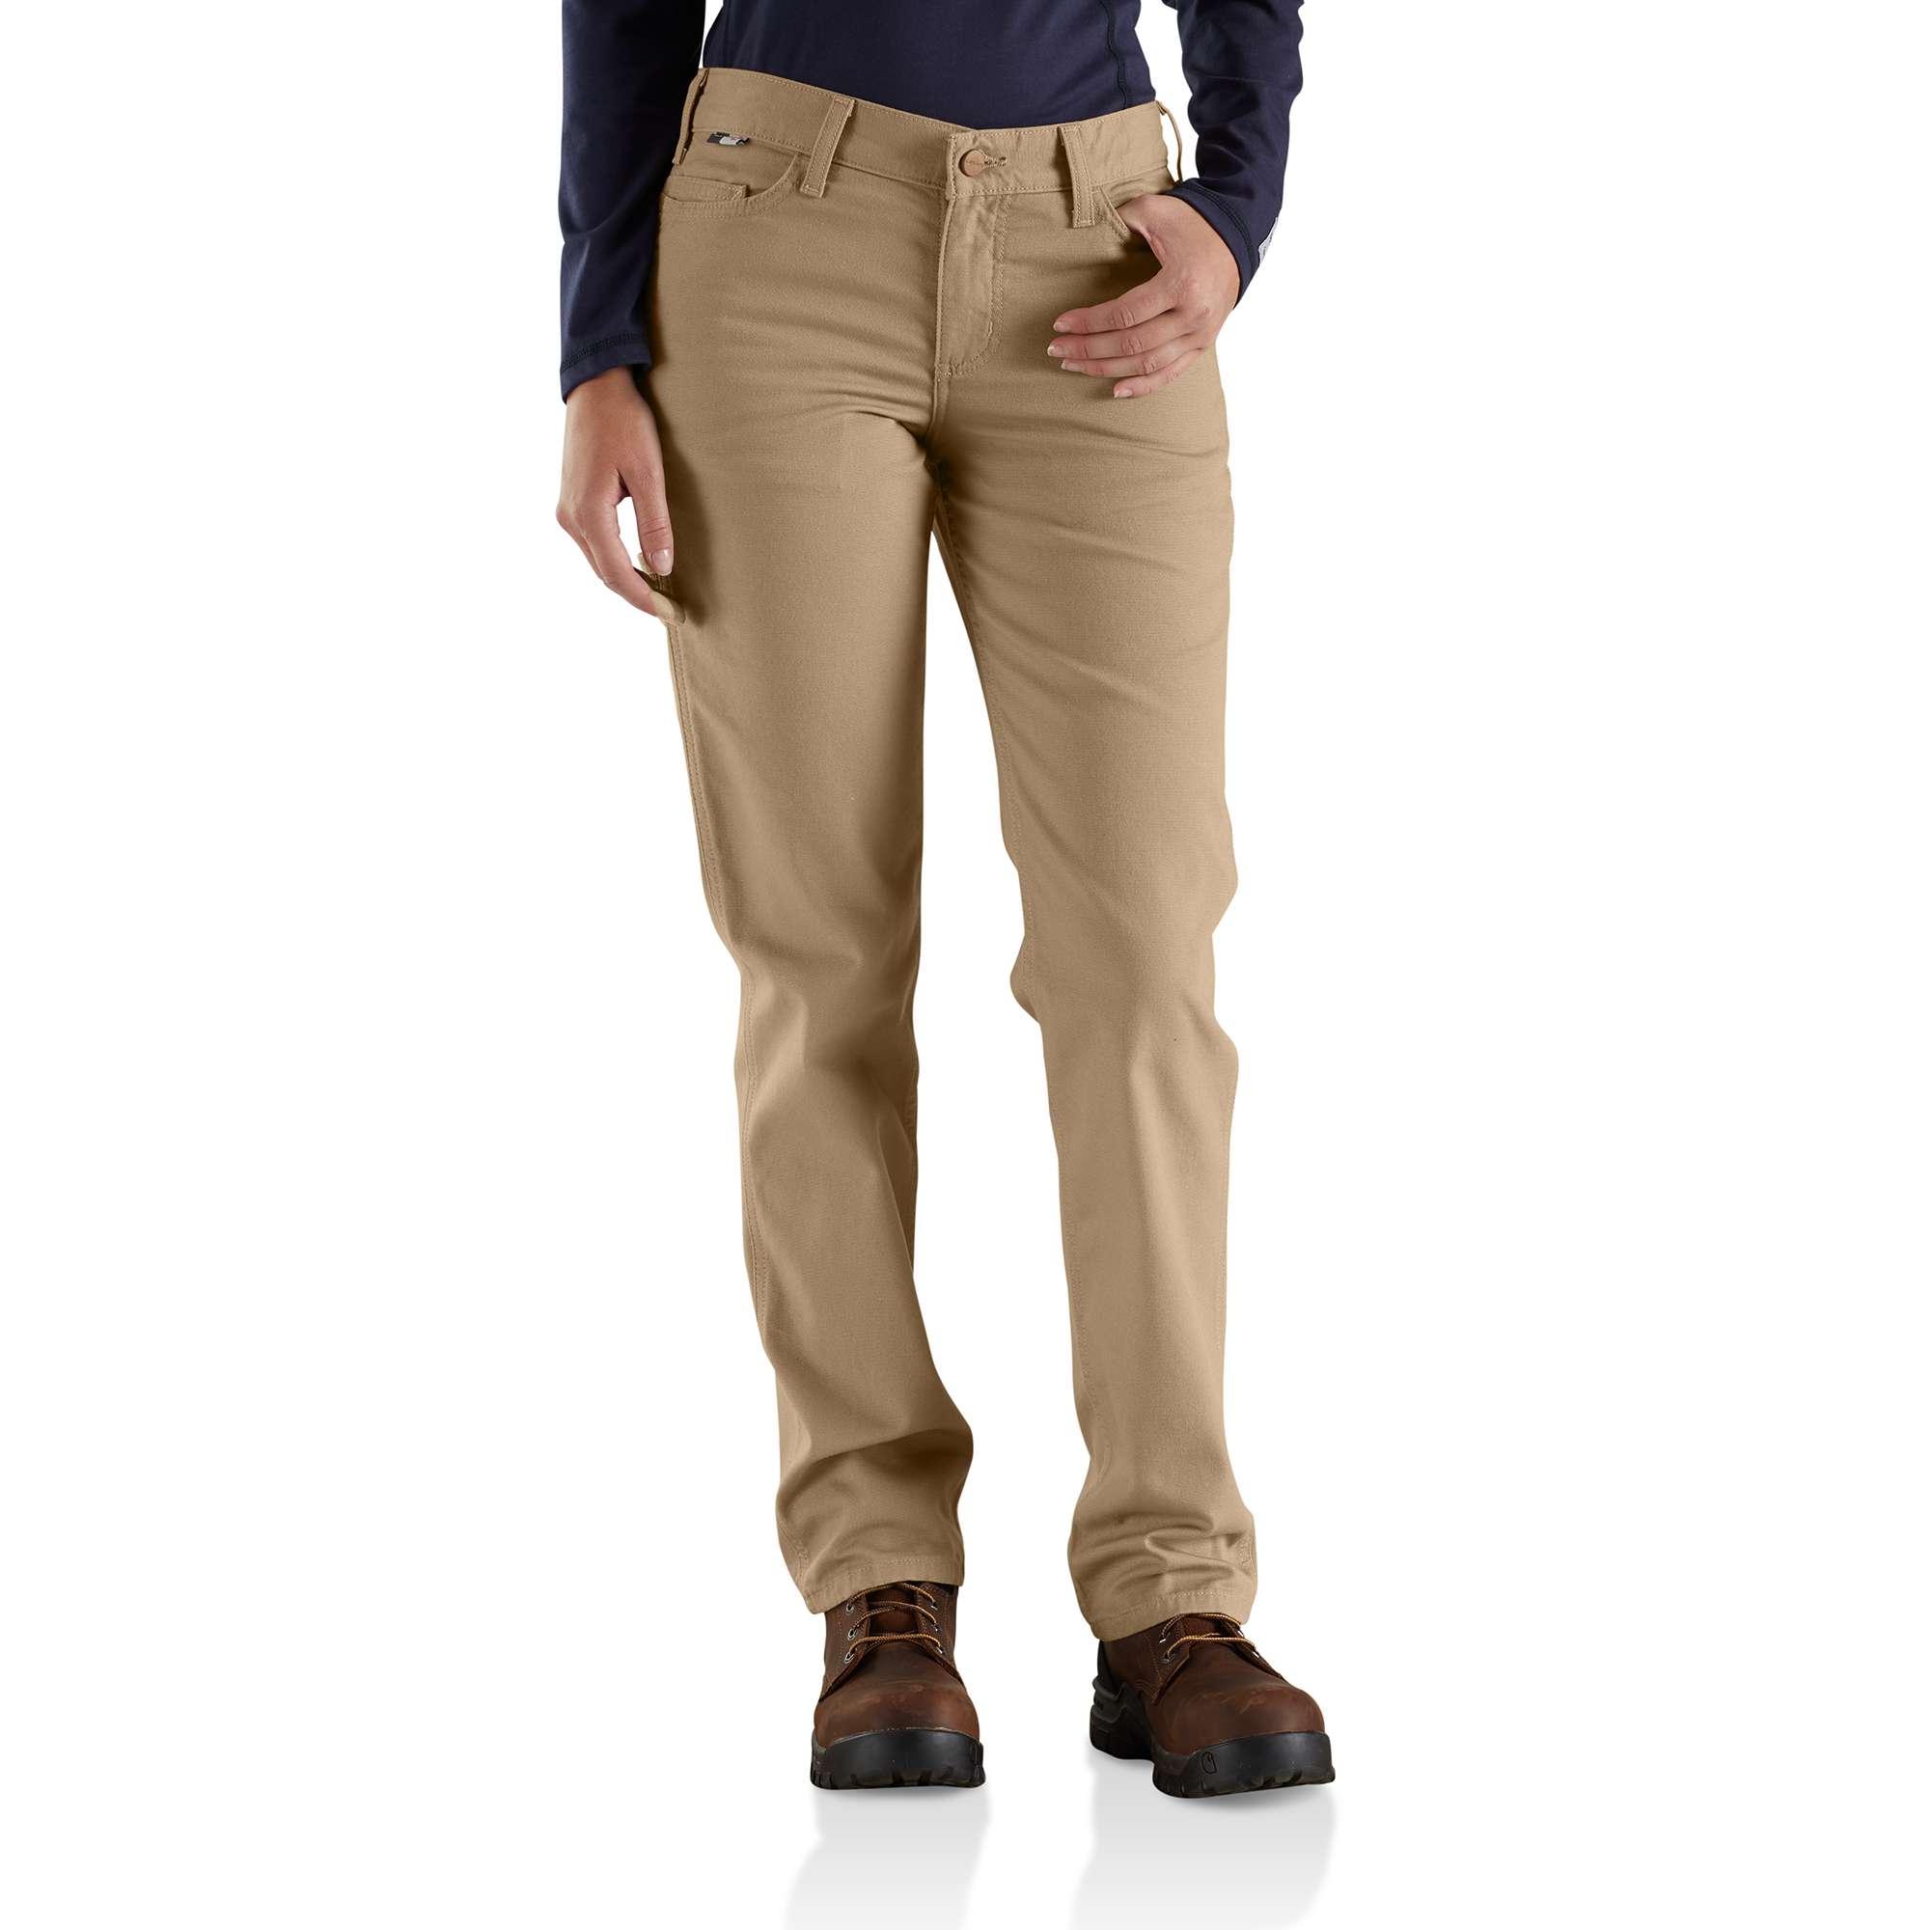 Carhartt Women's Fr Original-fit Rugged Flexcanvas Pant